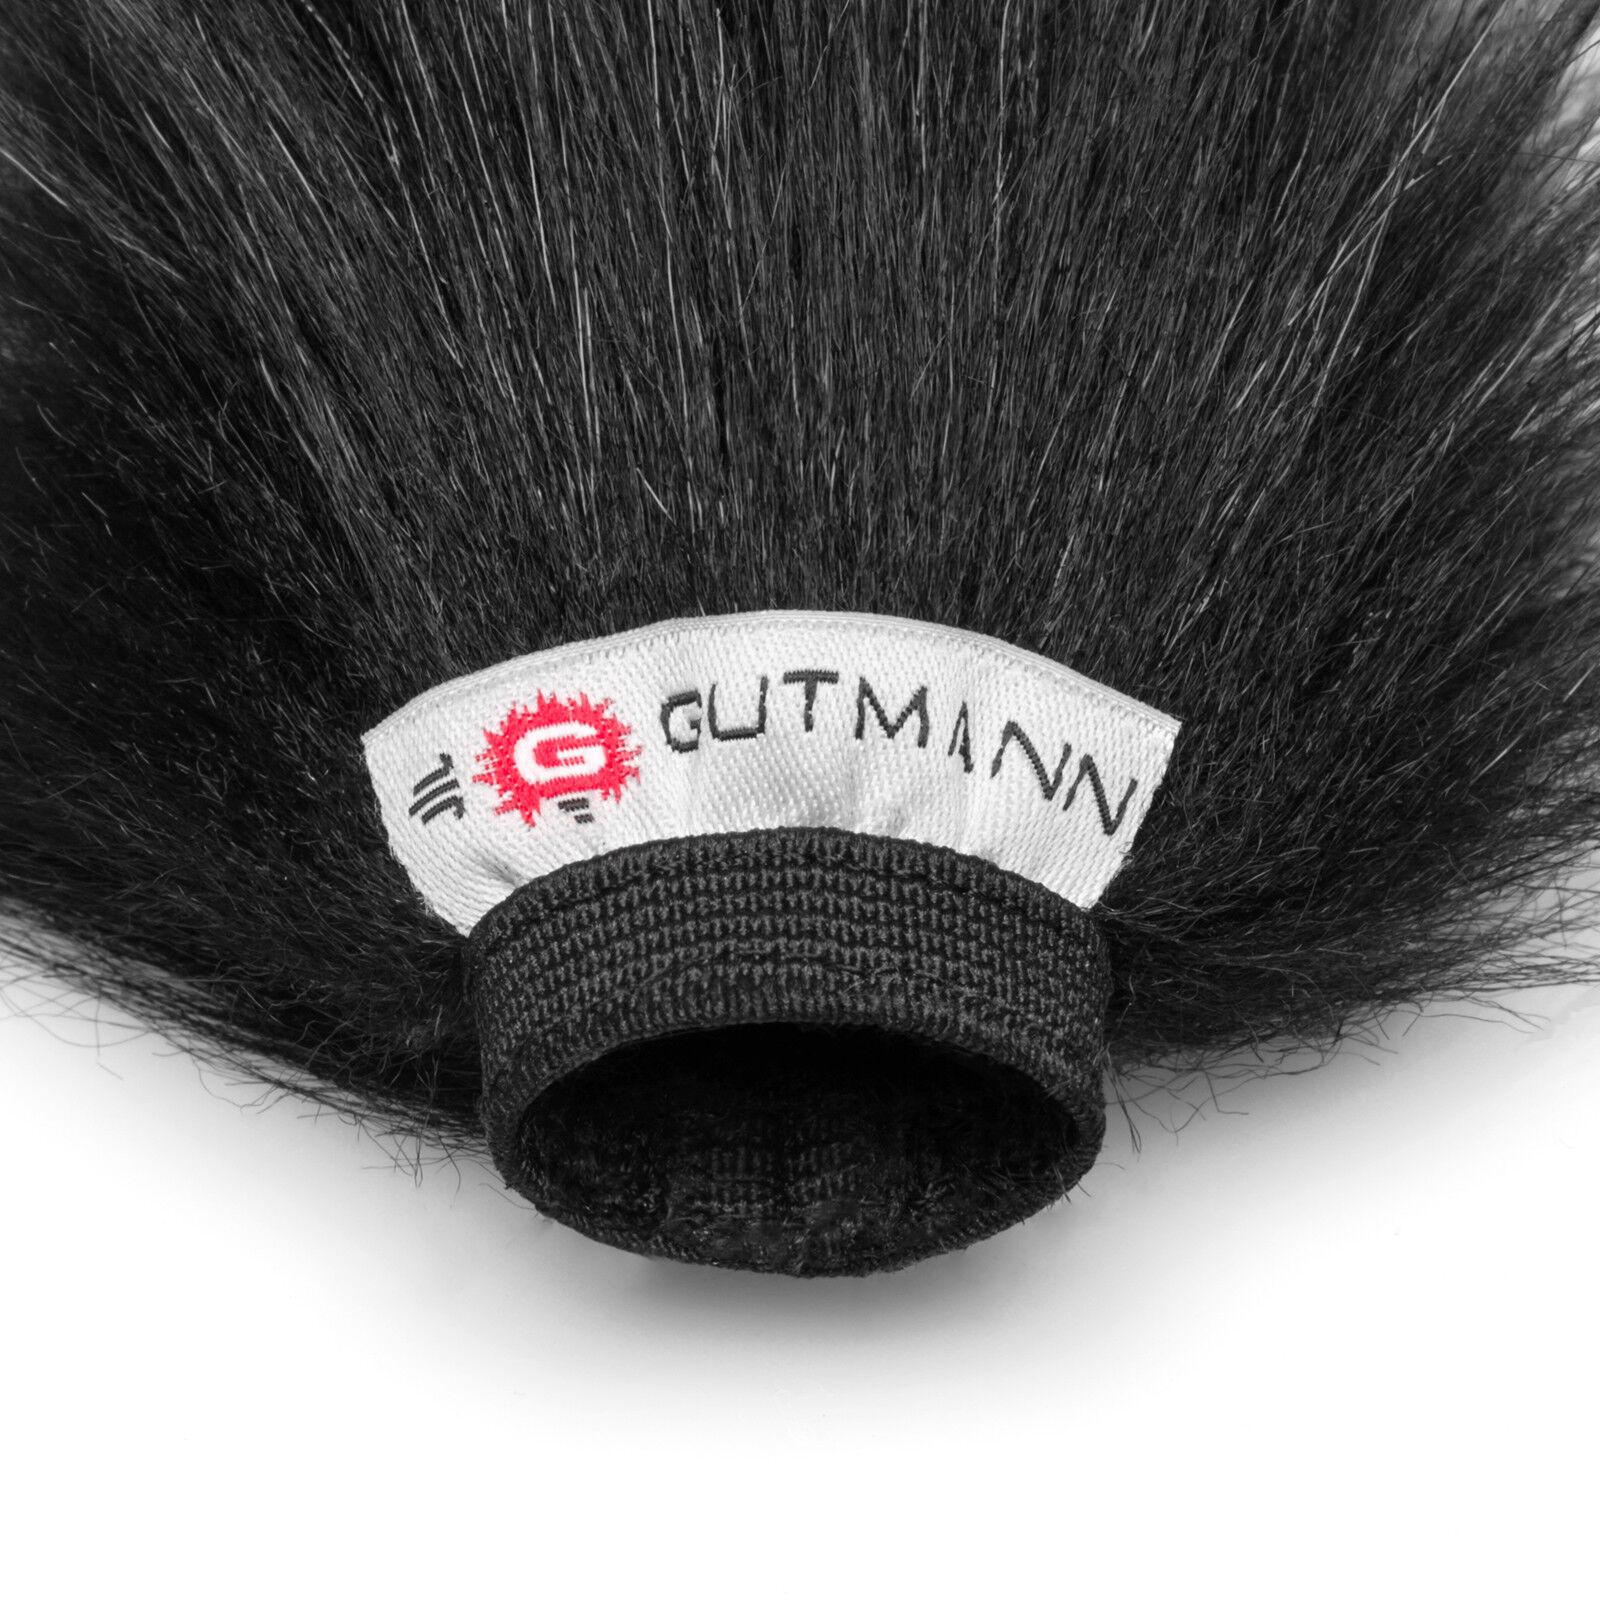 Gutmann Micrófono Parabrisas Parabrisas Para Sennheiser ME 64